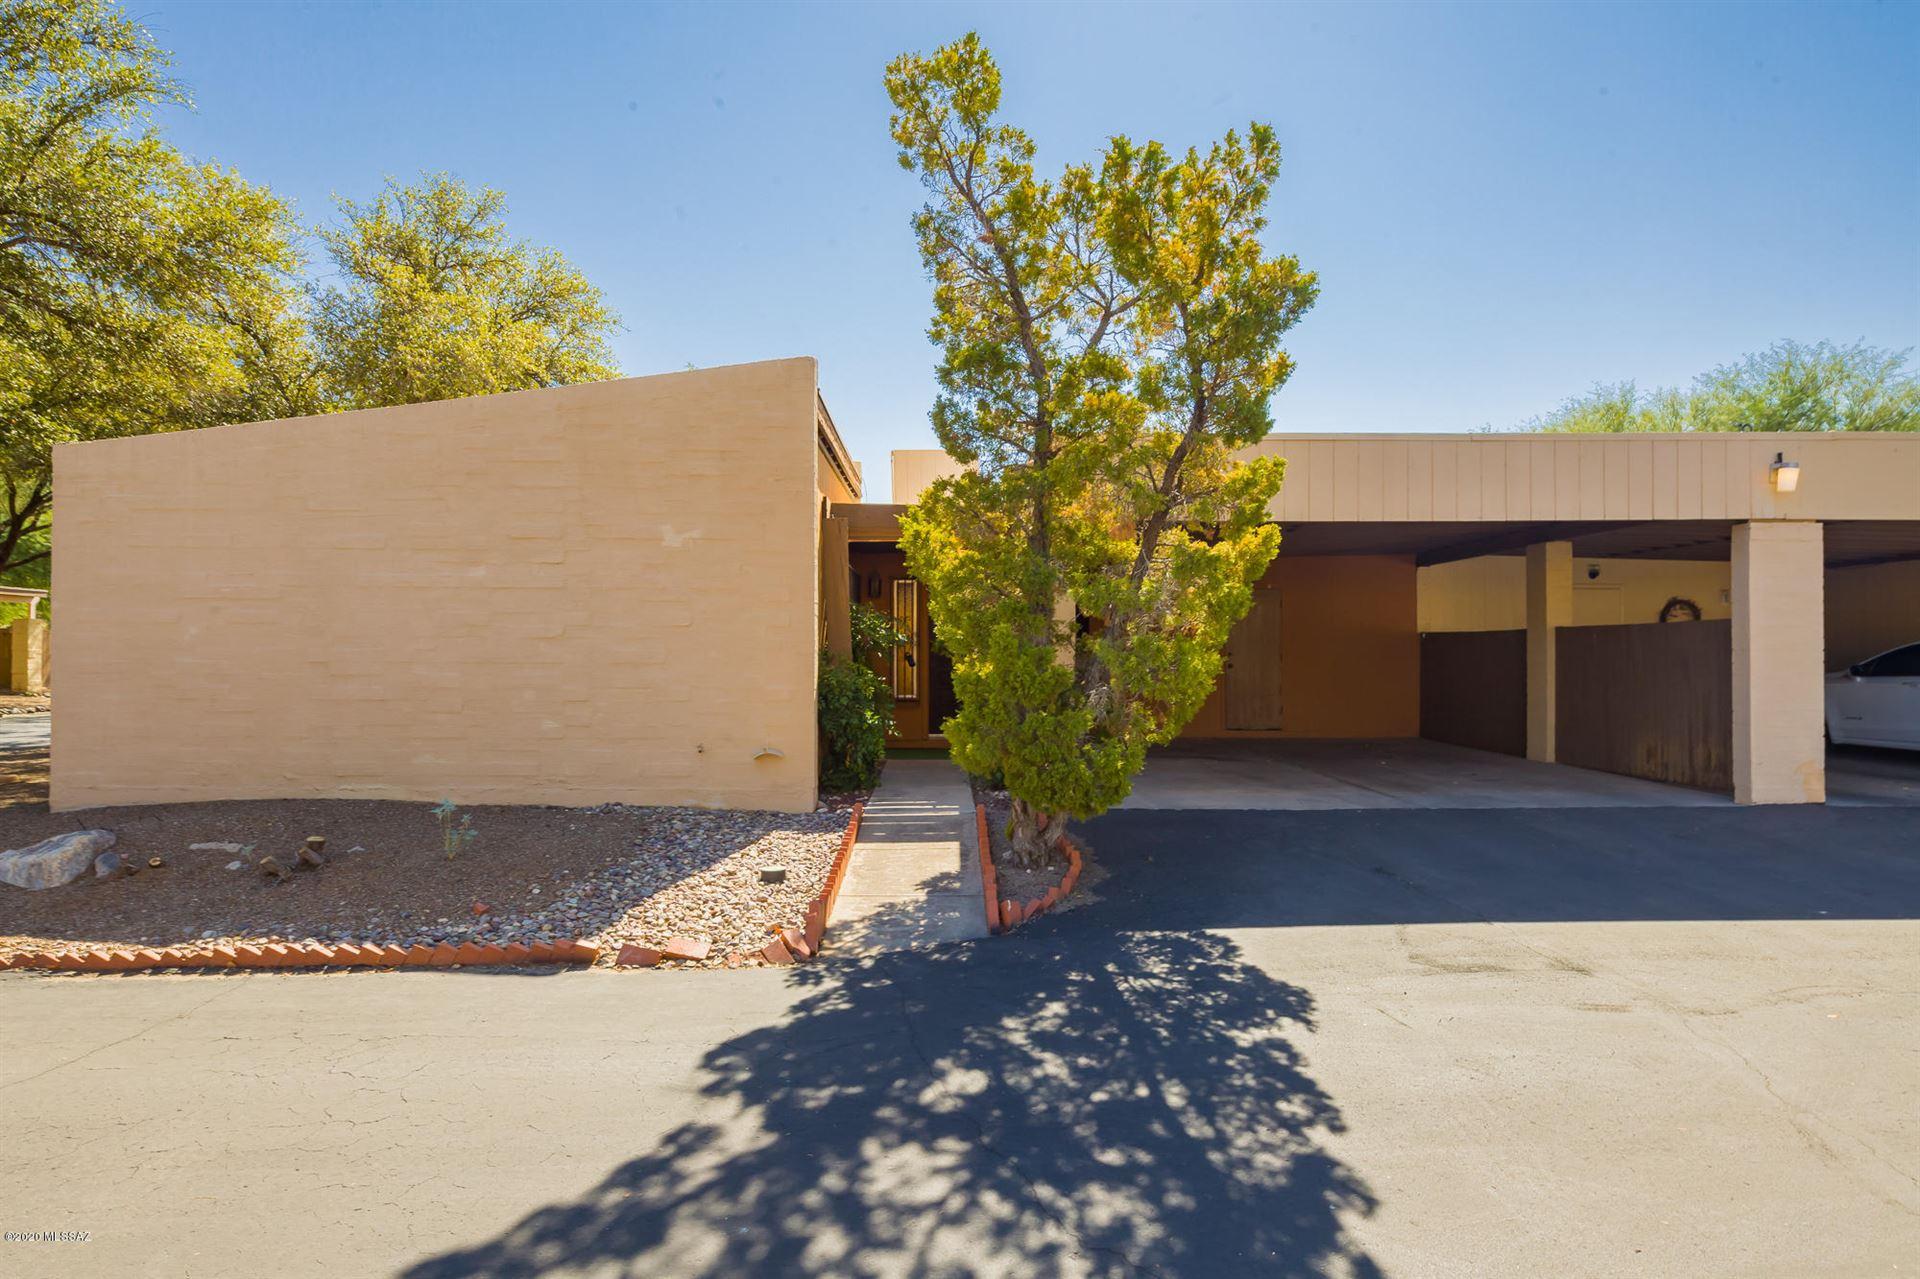 1931 N Camino Alicante, Tucson, AZ 85715 - #: 22025942